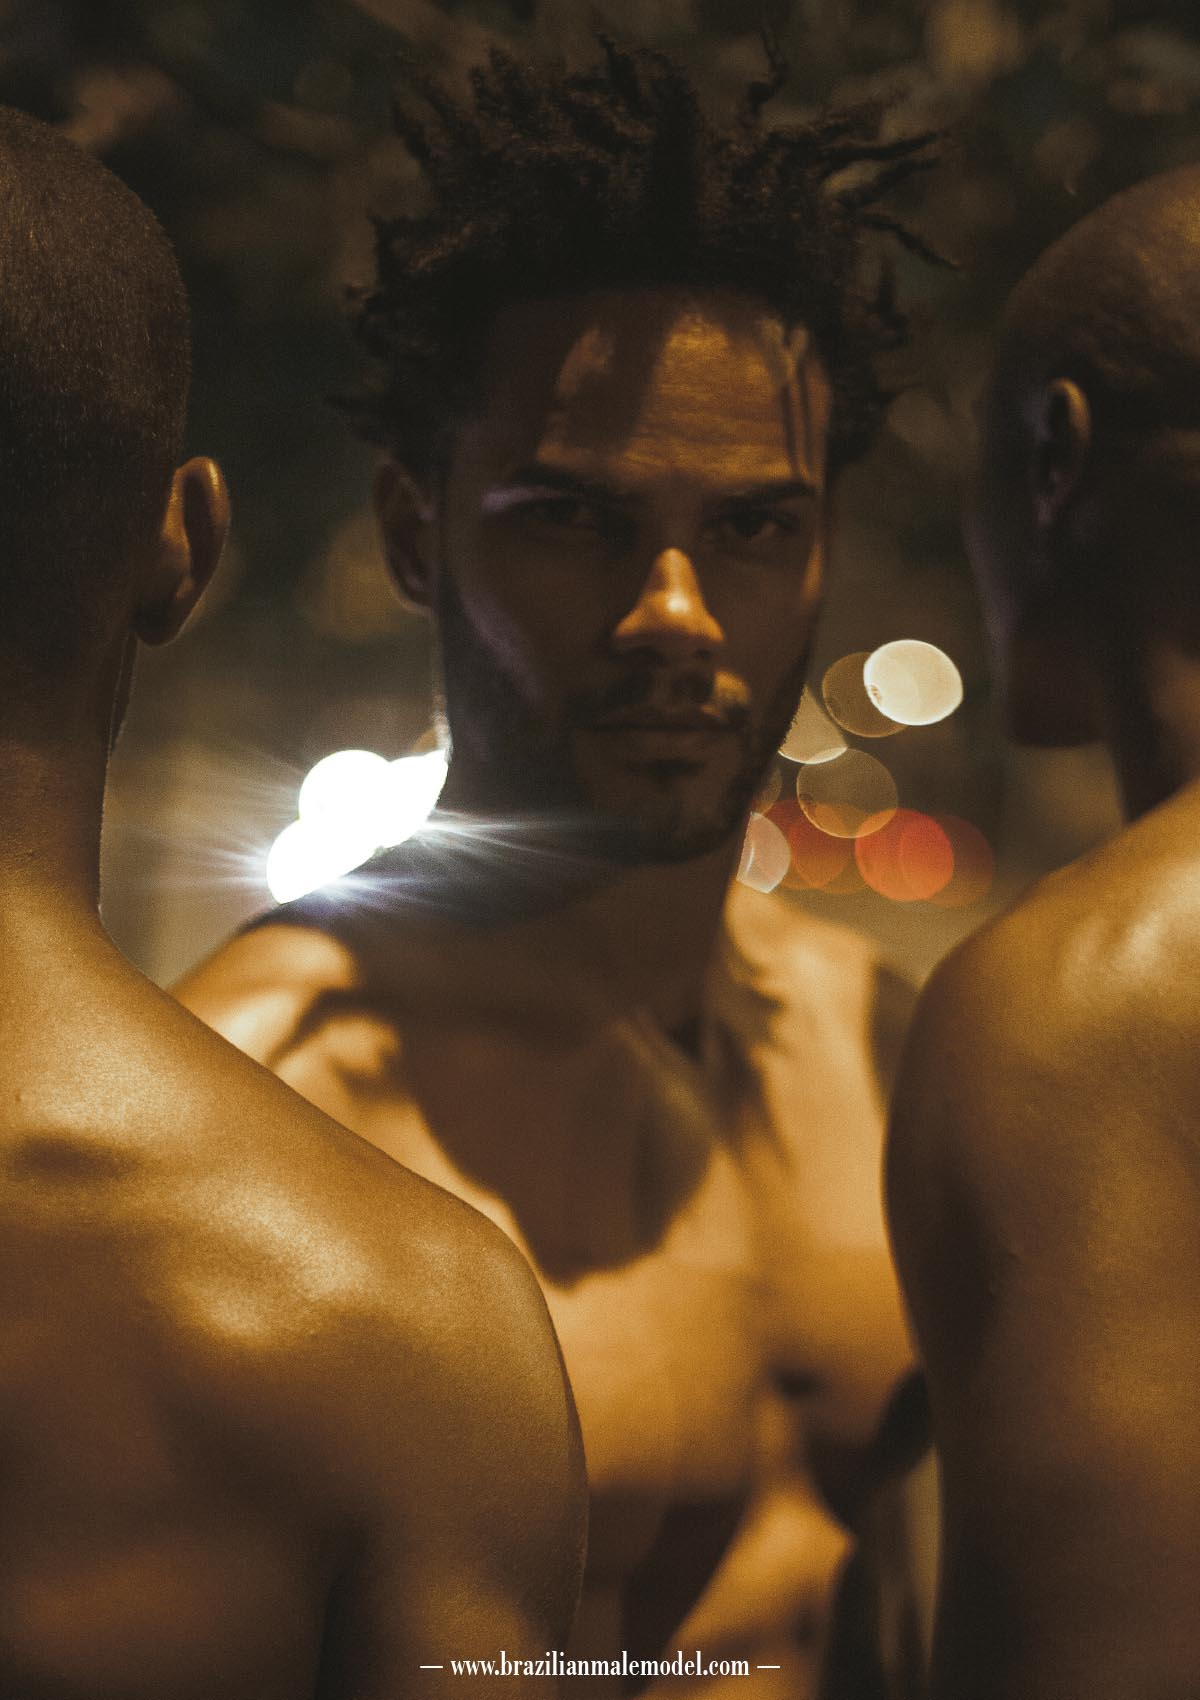 Hugo Cortes by Emerson Muniz for Brazilian Male Model